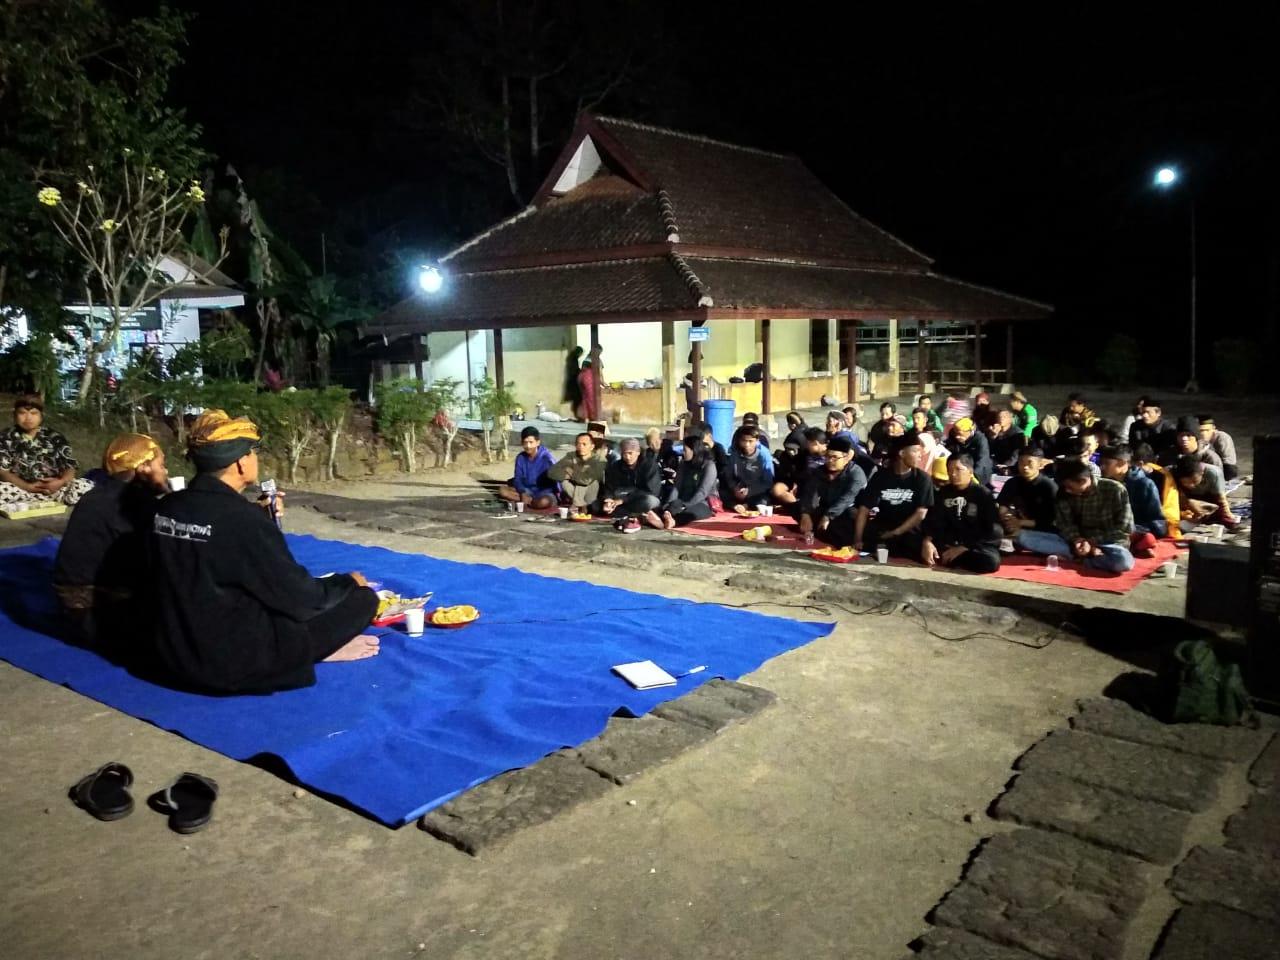 Malam renungan di Candi Penataran yang digelar LP2BN.(Foto : Malik Naharul/BlitarTIMES)